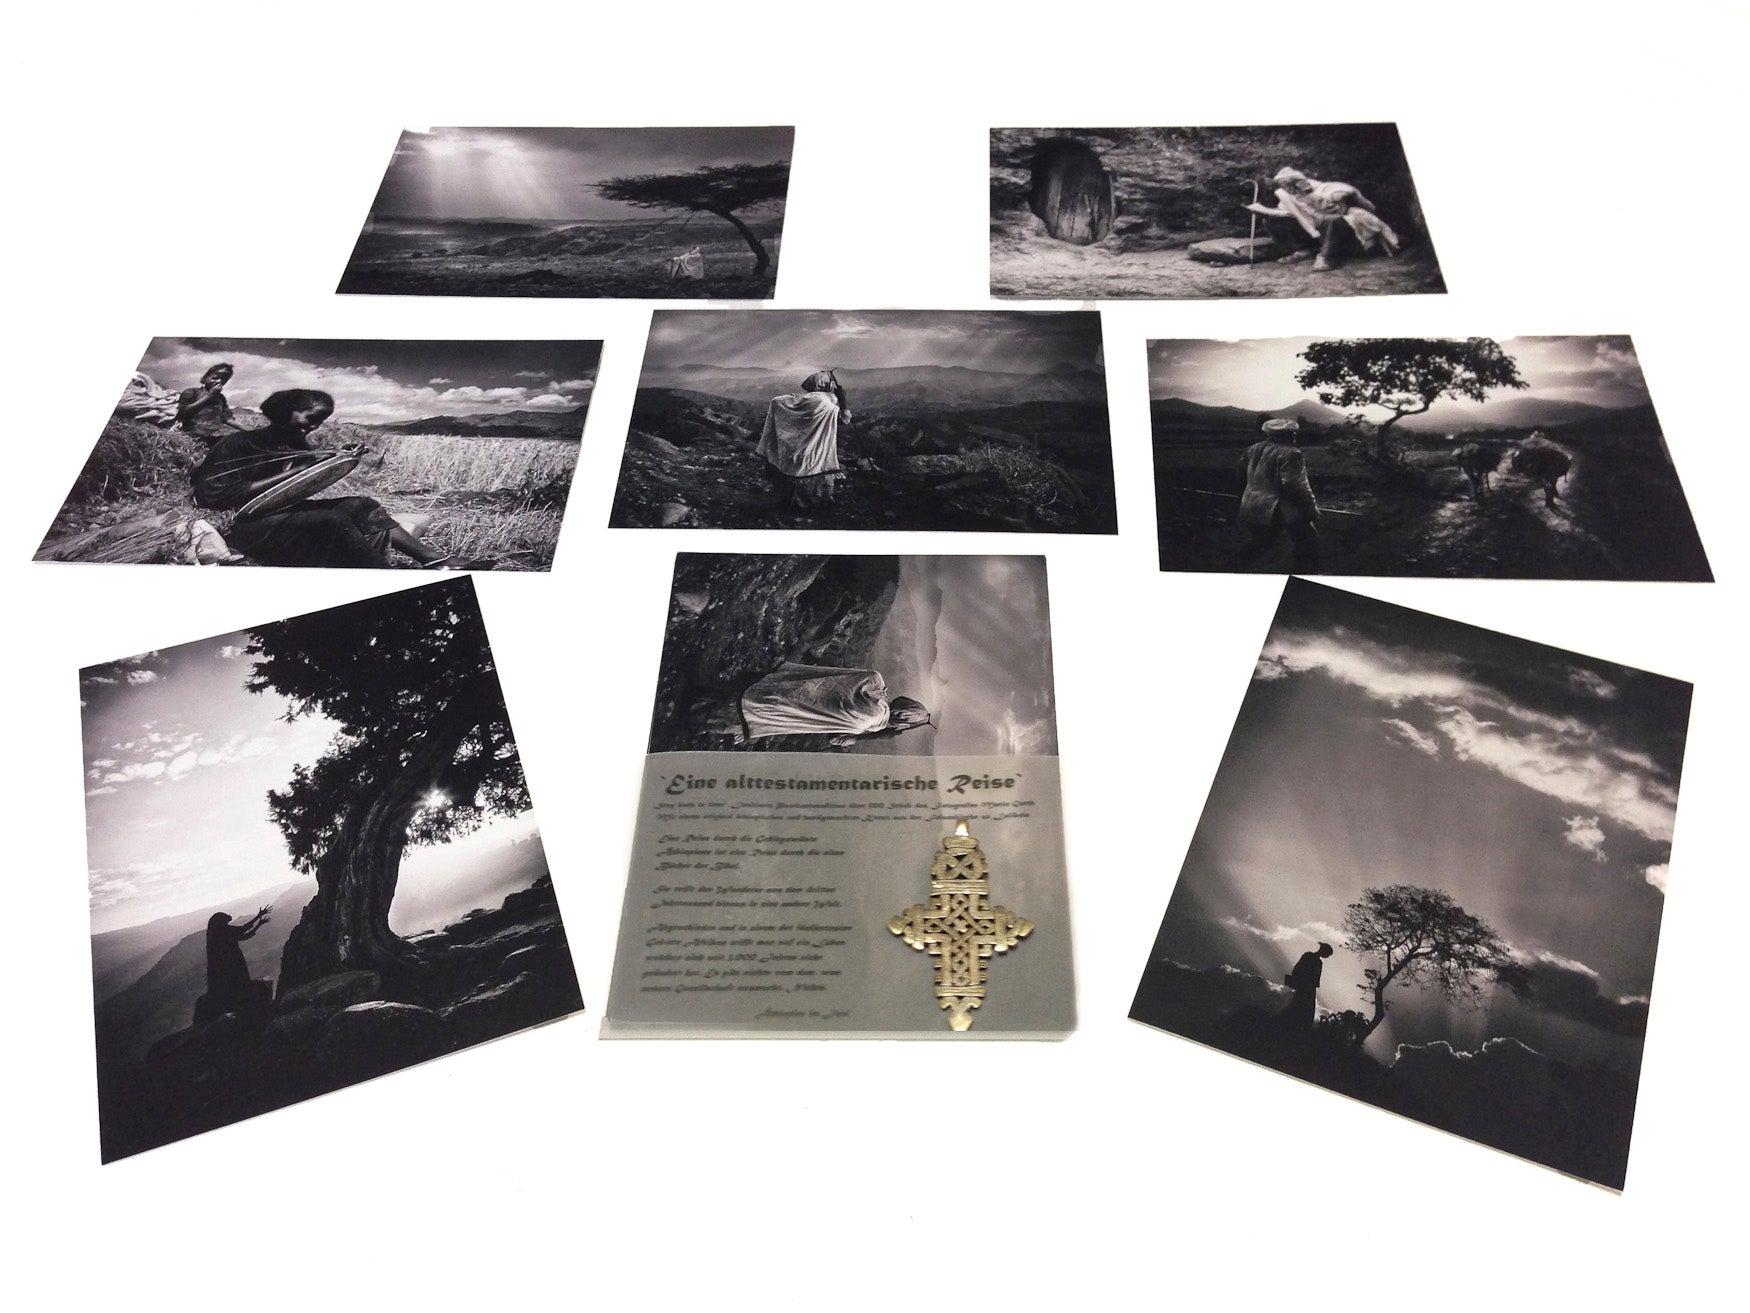 Limited Edition Postcard Set Inc. An Original Handmade Cross